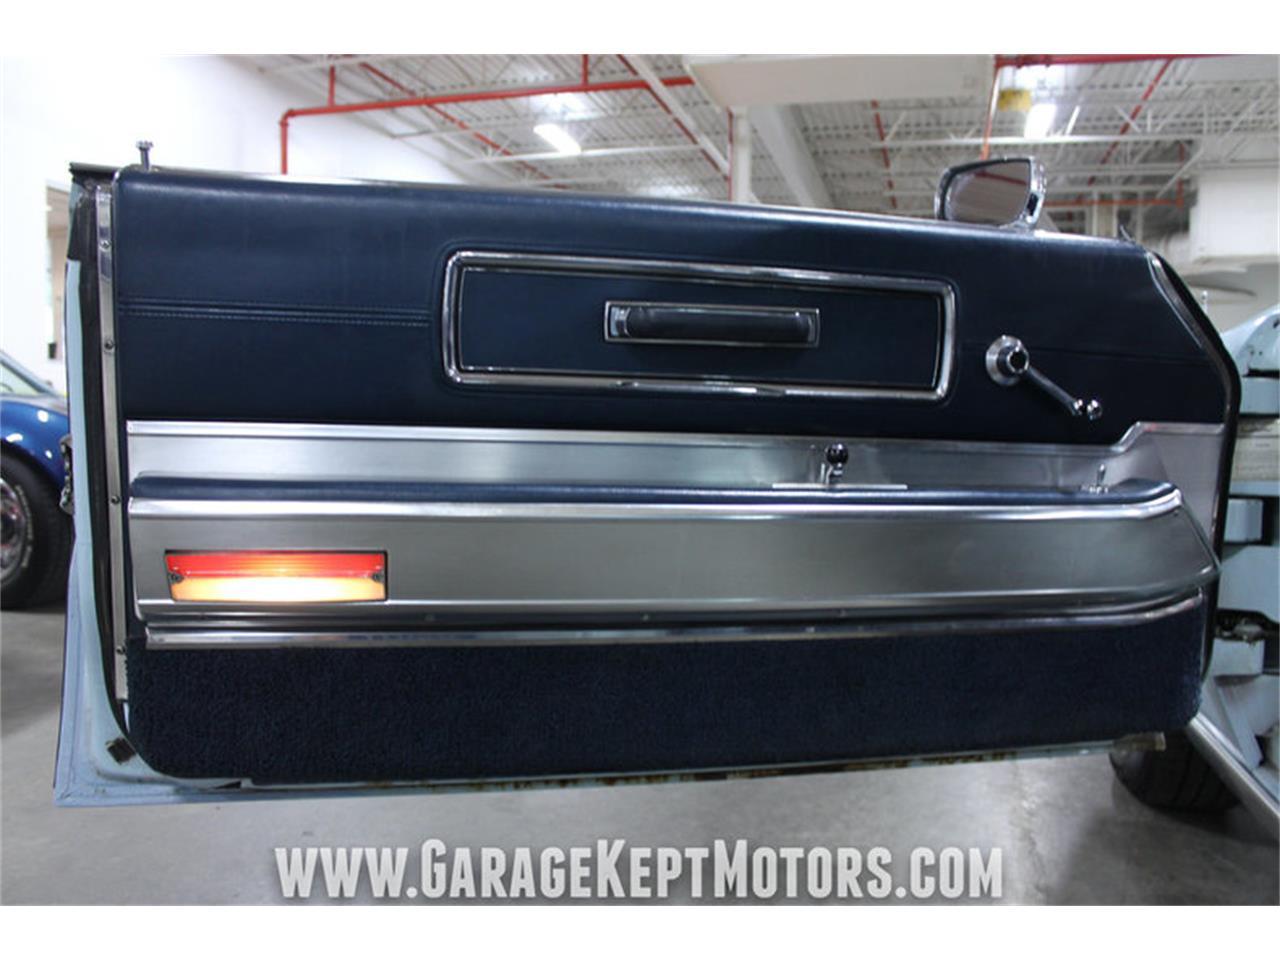 Large Picture of 1967 Ford Thunderbird 2-Door Landau - $11,900.00 Offered by Garage Kept Motors - LU7P